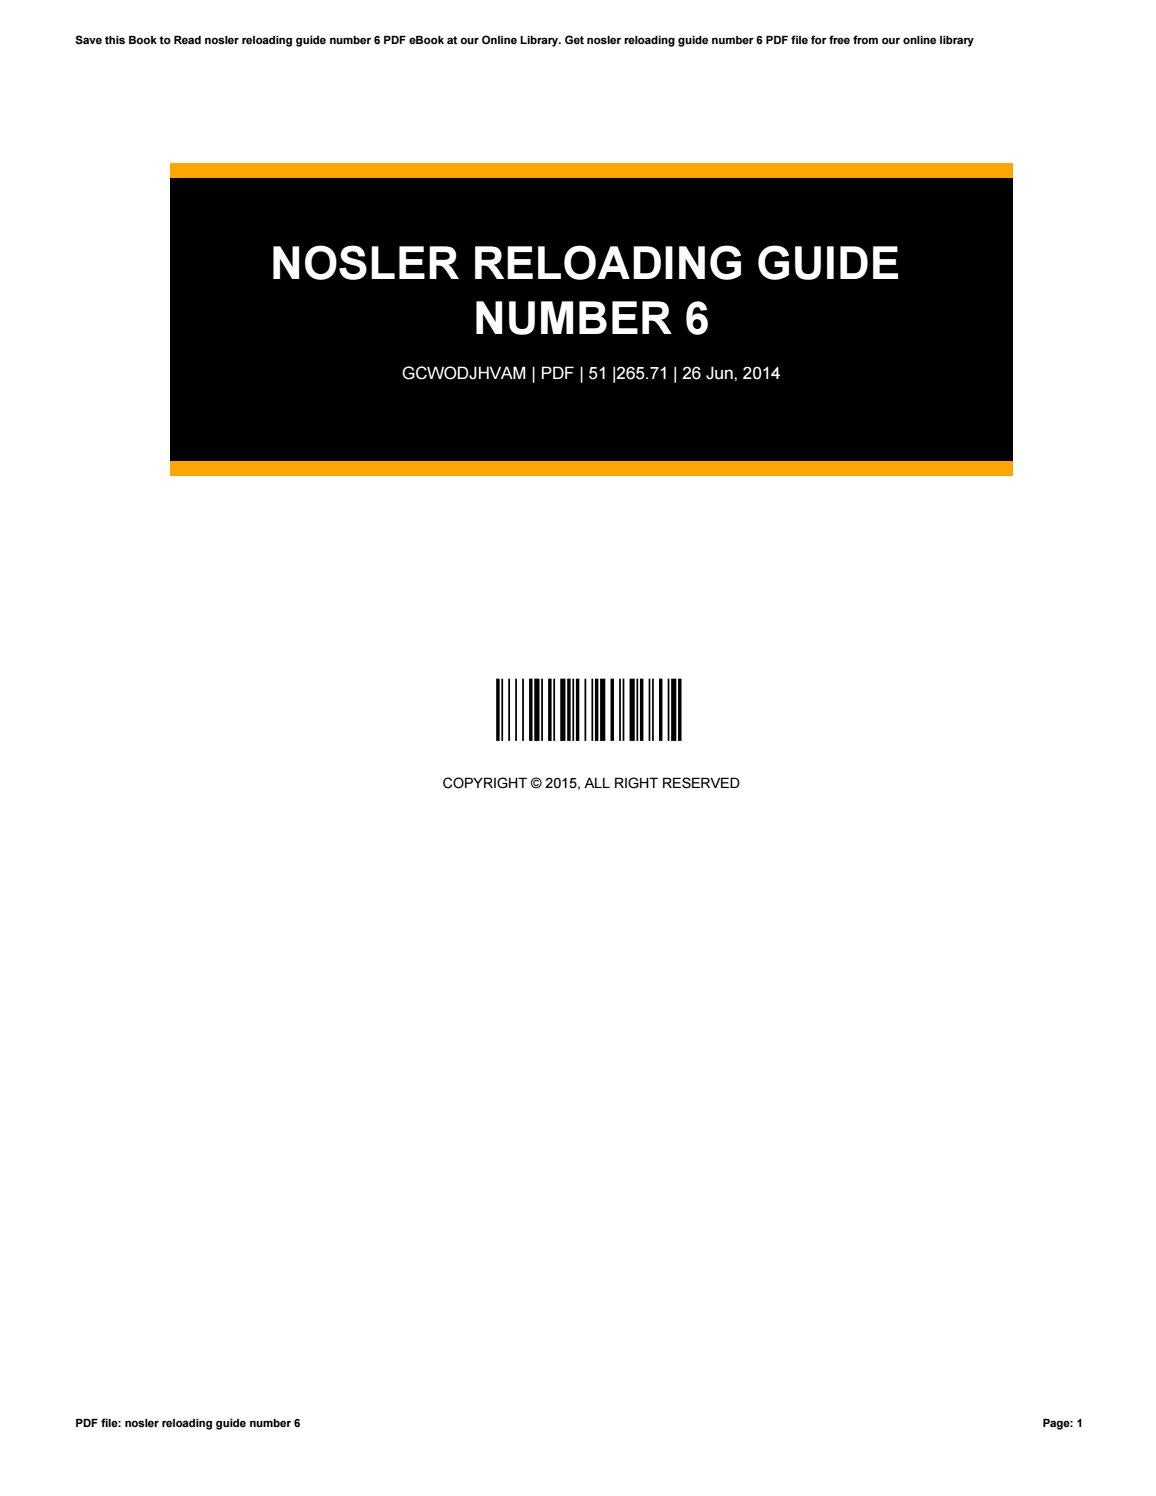 nosler reloading guide number 6 by johncrawford1752 issuu rh issuu com Nosler Ammo Nosler Reloading Data 308